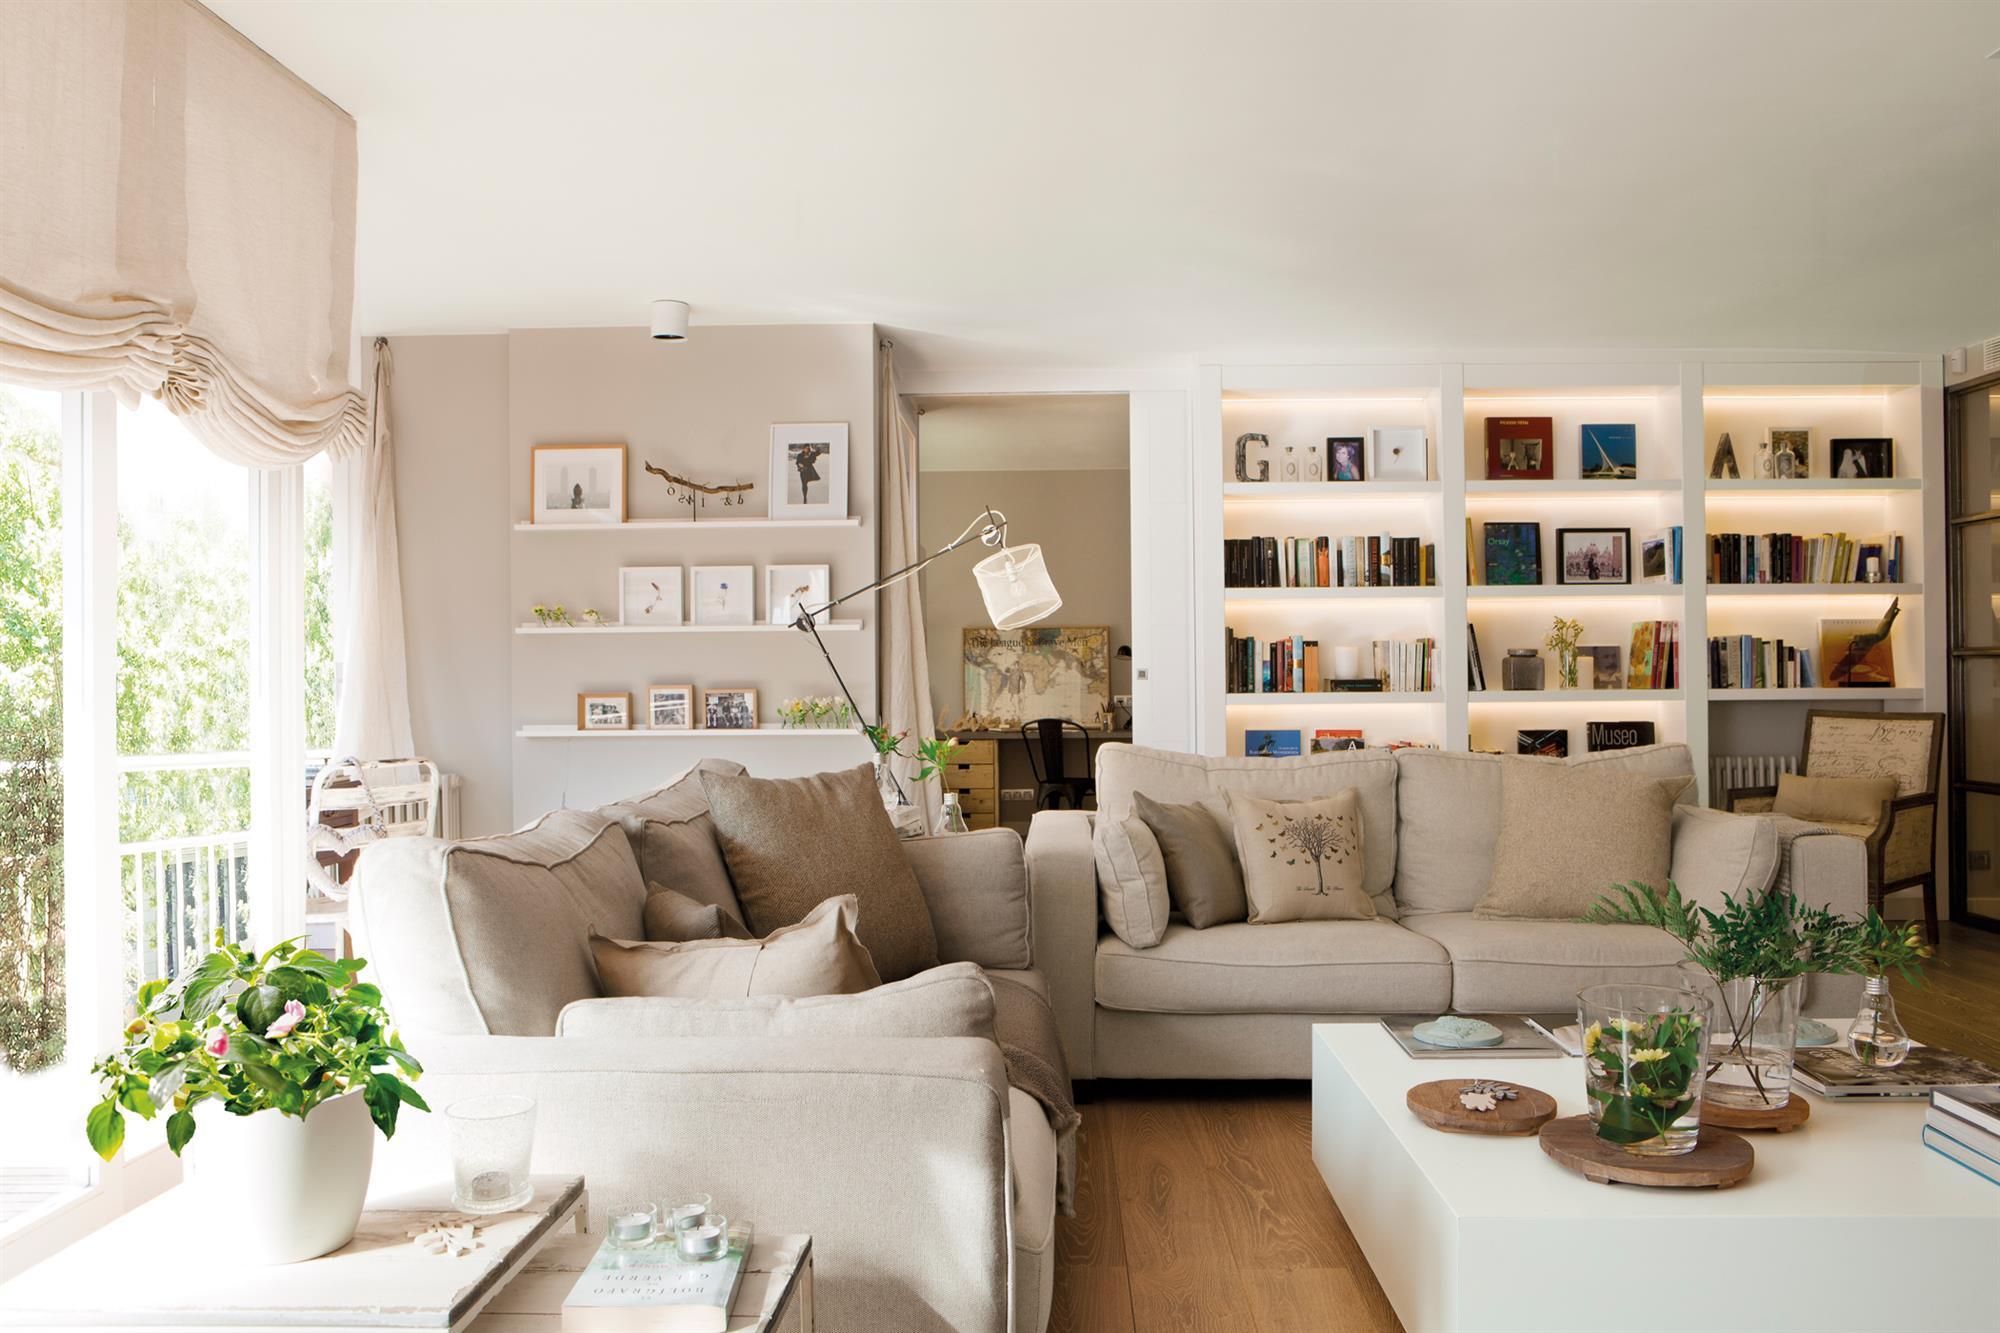 Mi casa cada d a mejor 20 ideas para un cambio expr s for Puertas decorativas para interiores